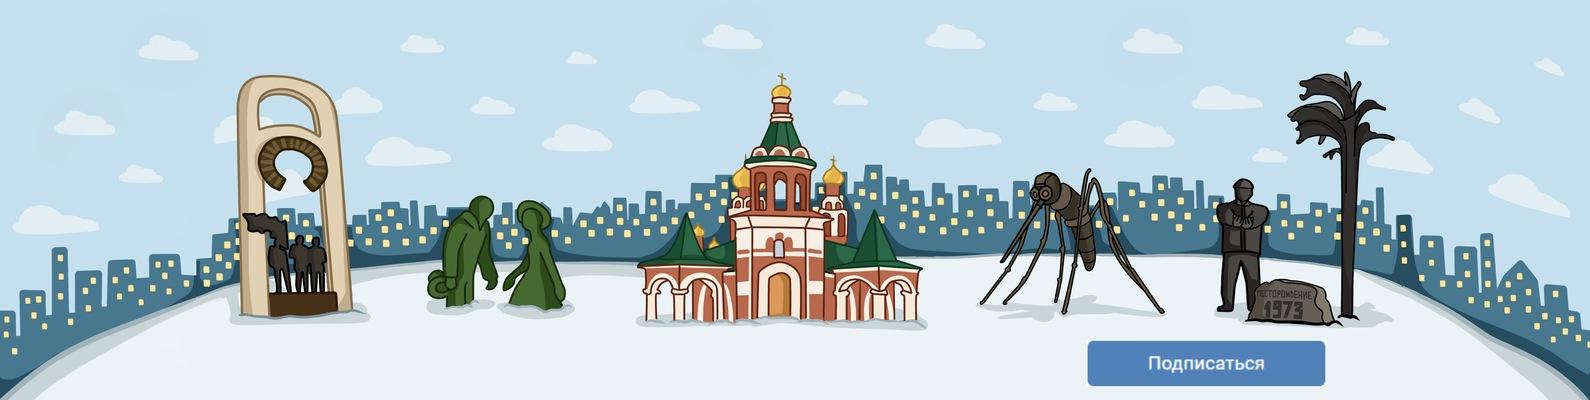 Усинск в объективе | ВКонтакте